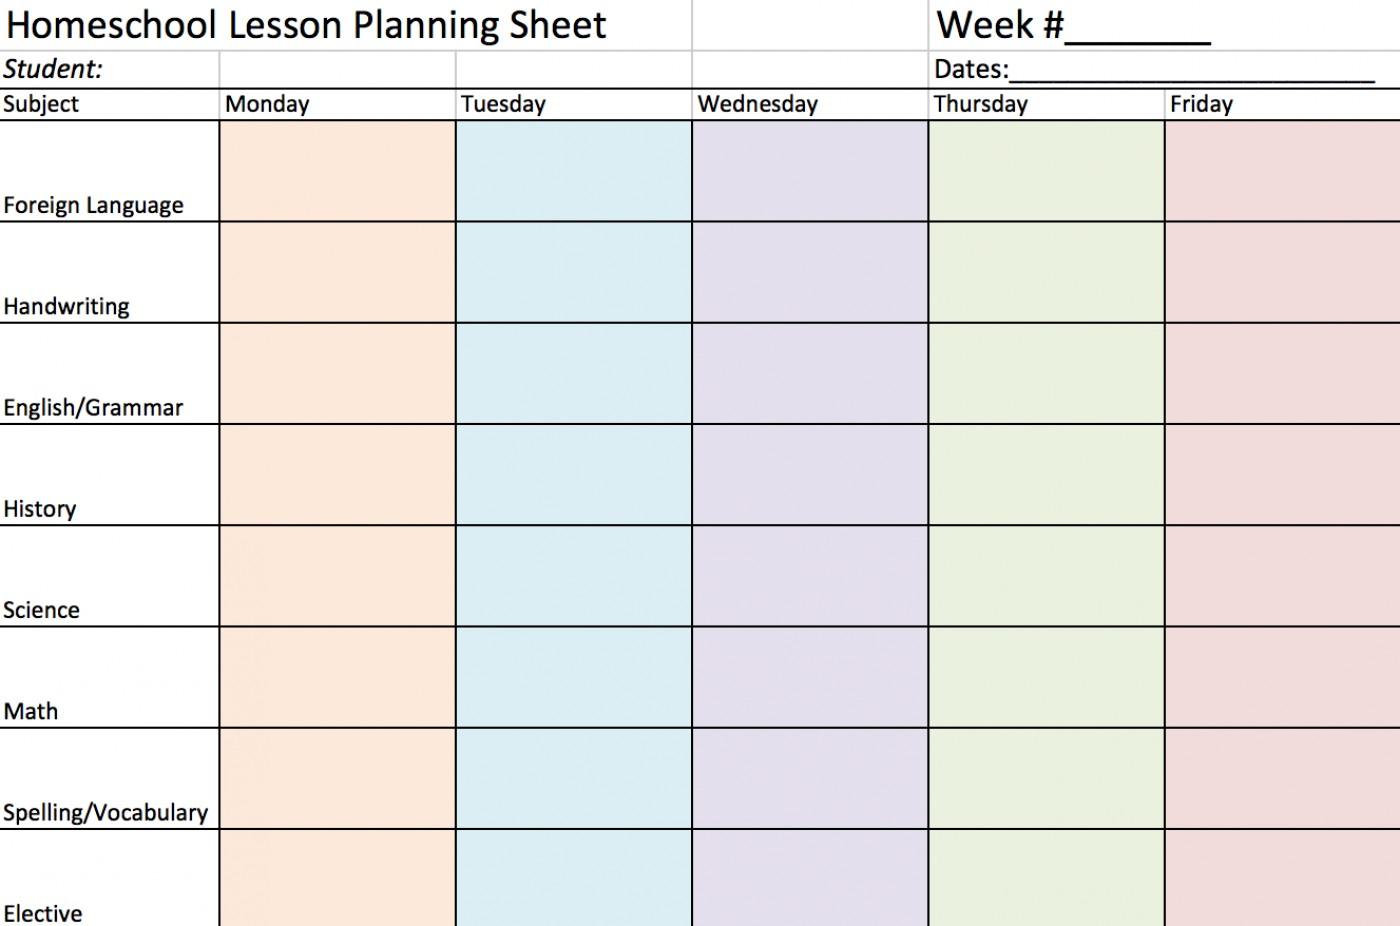 015 5Th Grade Homeschool Lessons Download Free Template For Middle - Homeschool Lesson Planner Free Printable